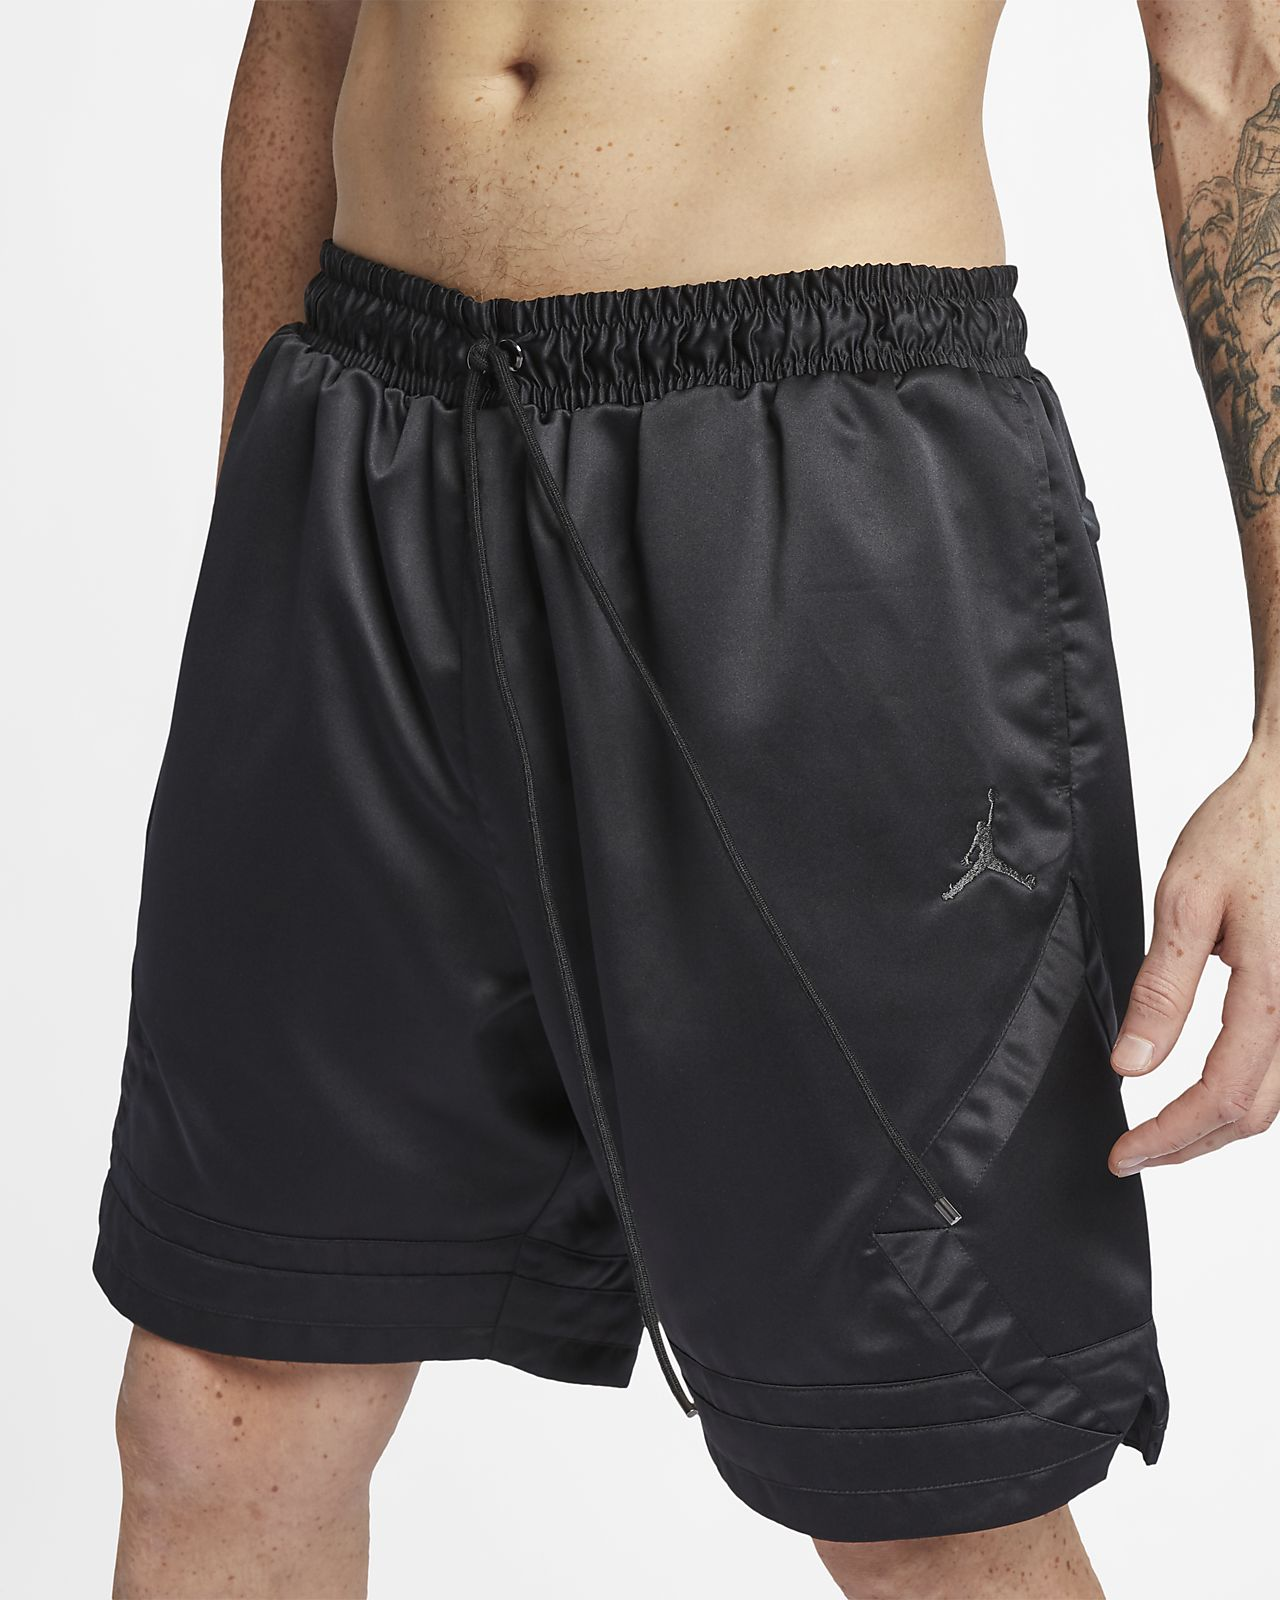 53f1895df47 Shorts para hombre Jordan Satin Diamond. Nike.com MX